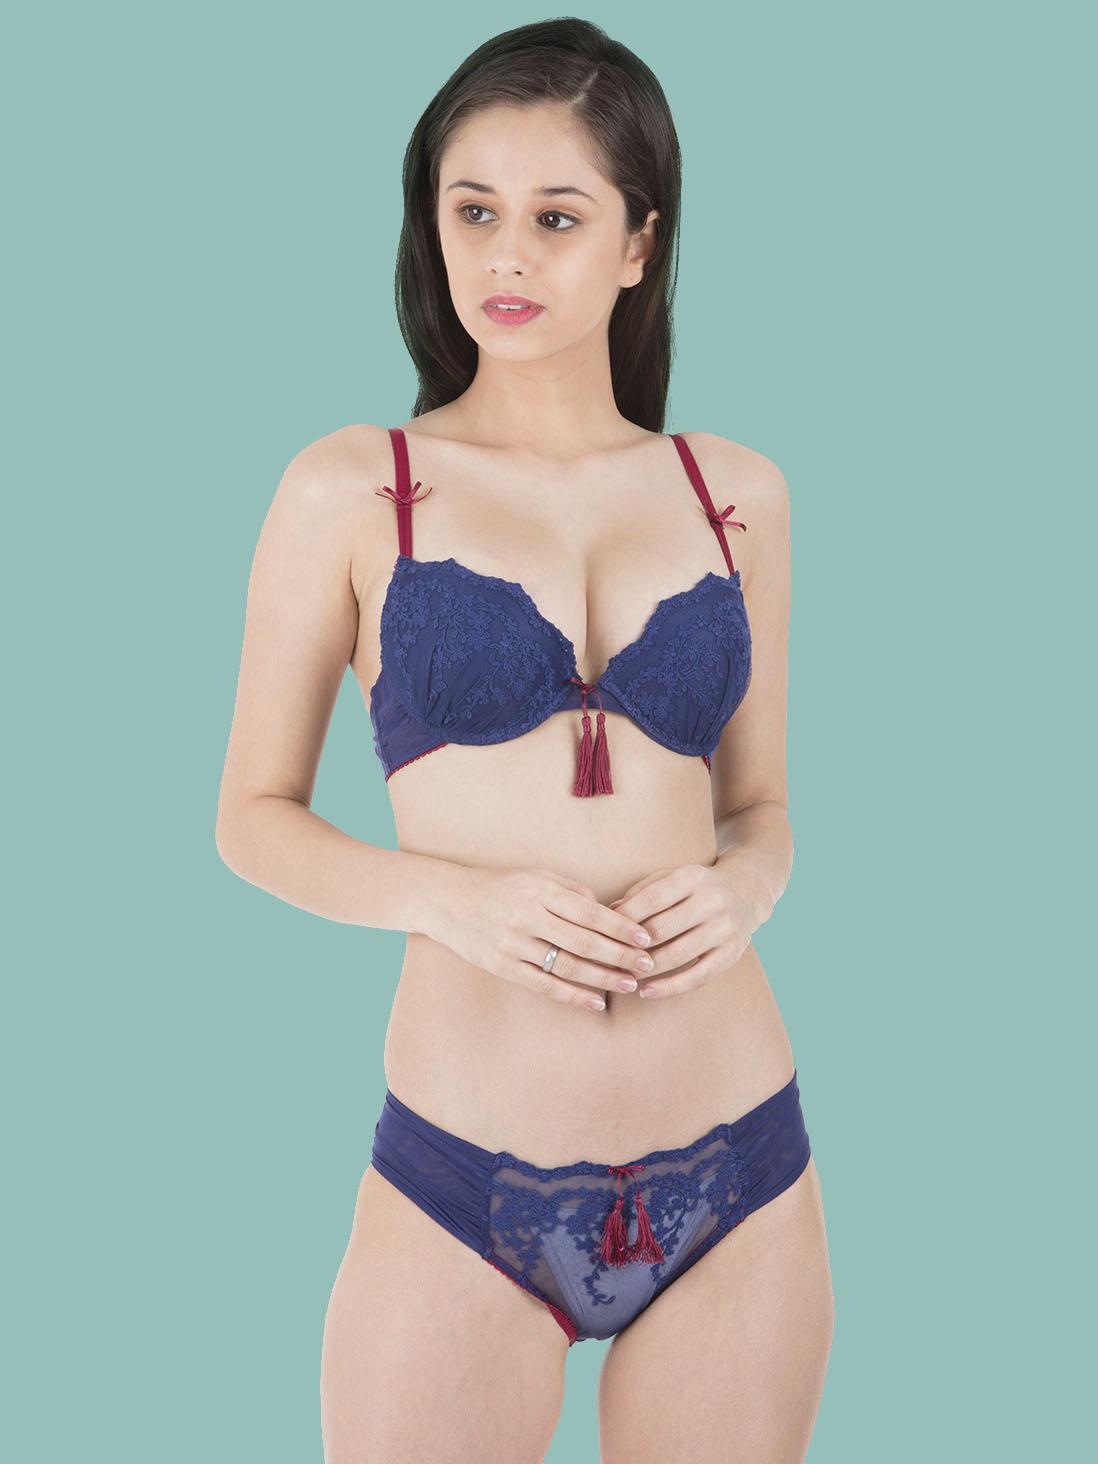 a6f9a713de Shyle Red Seamed Bralette Bra Panty Set